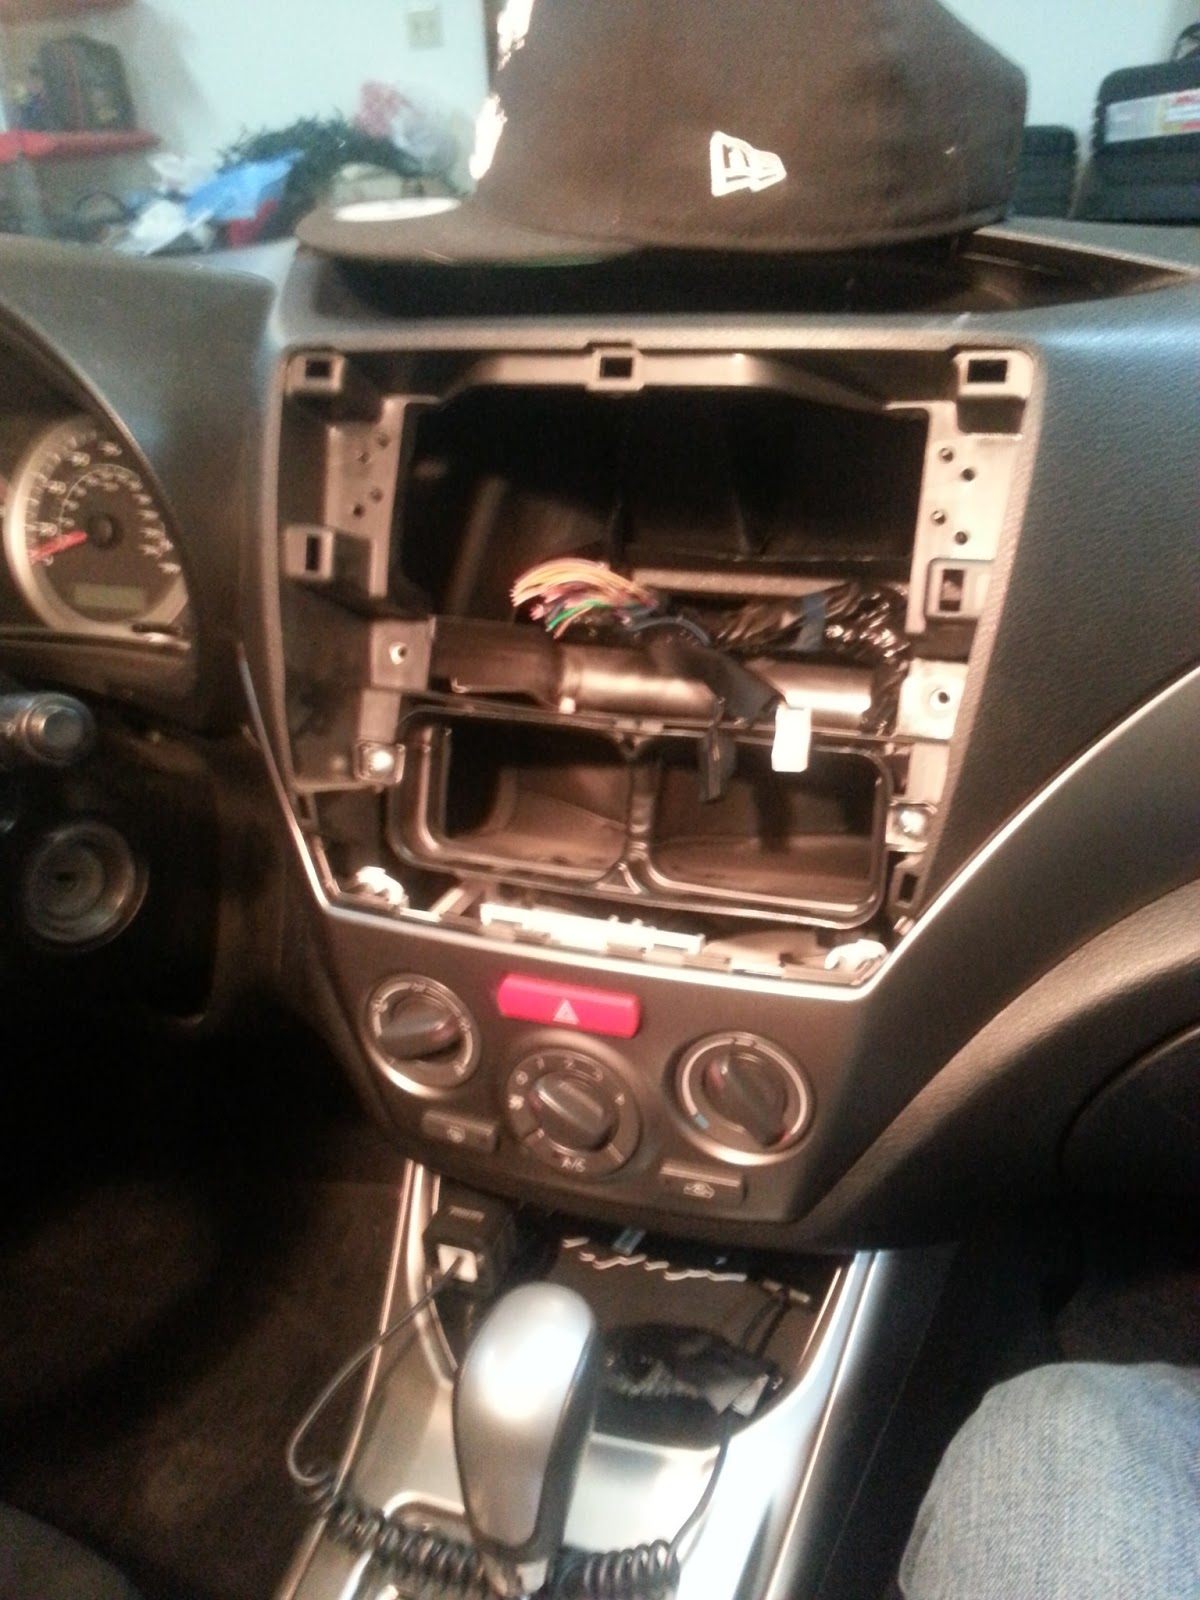 Subaru Kenwood Radio Wiring Harness Trusted Diagram 2010 Stereo Pinout Bass On Wheels Impreza Install Colors